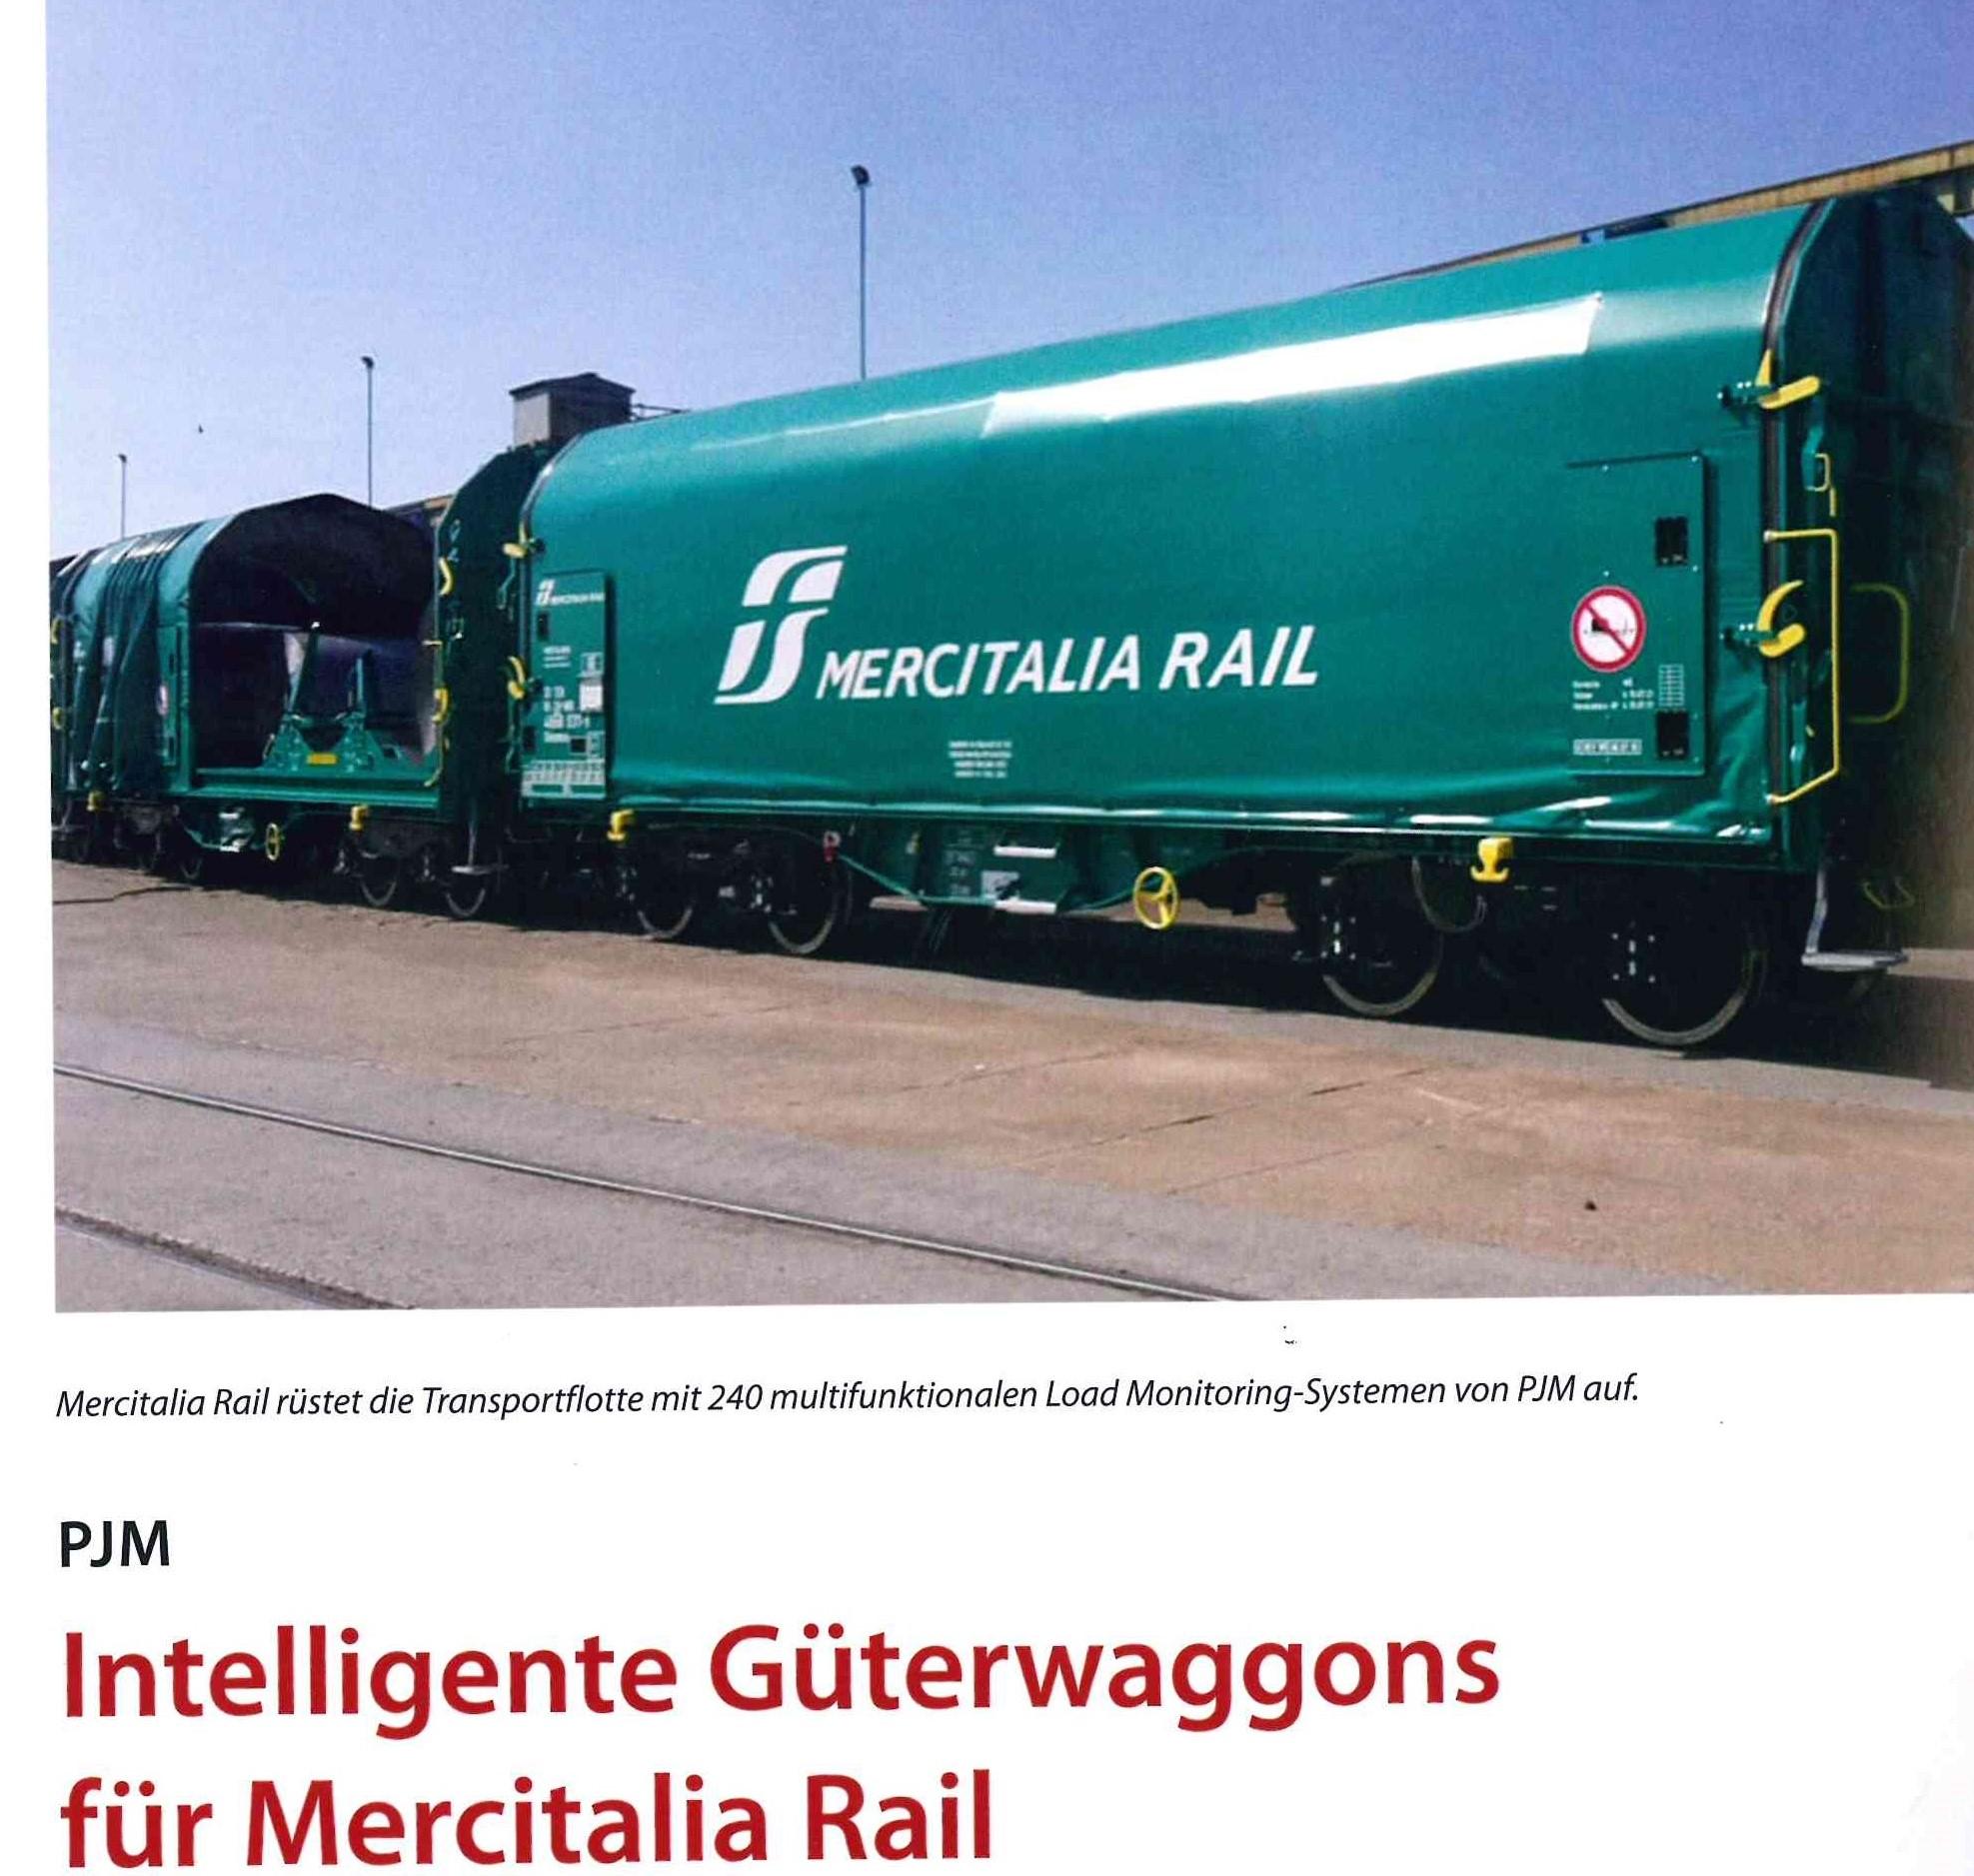 PrivatbahnMagazin_Mercitalia_Websitebild3_2019